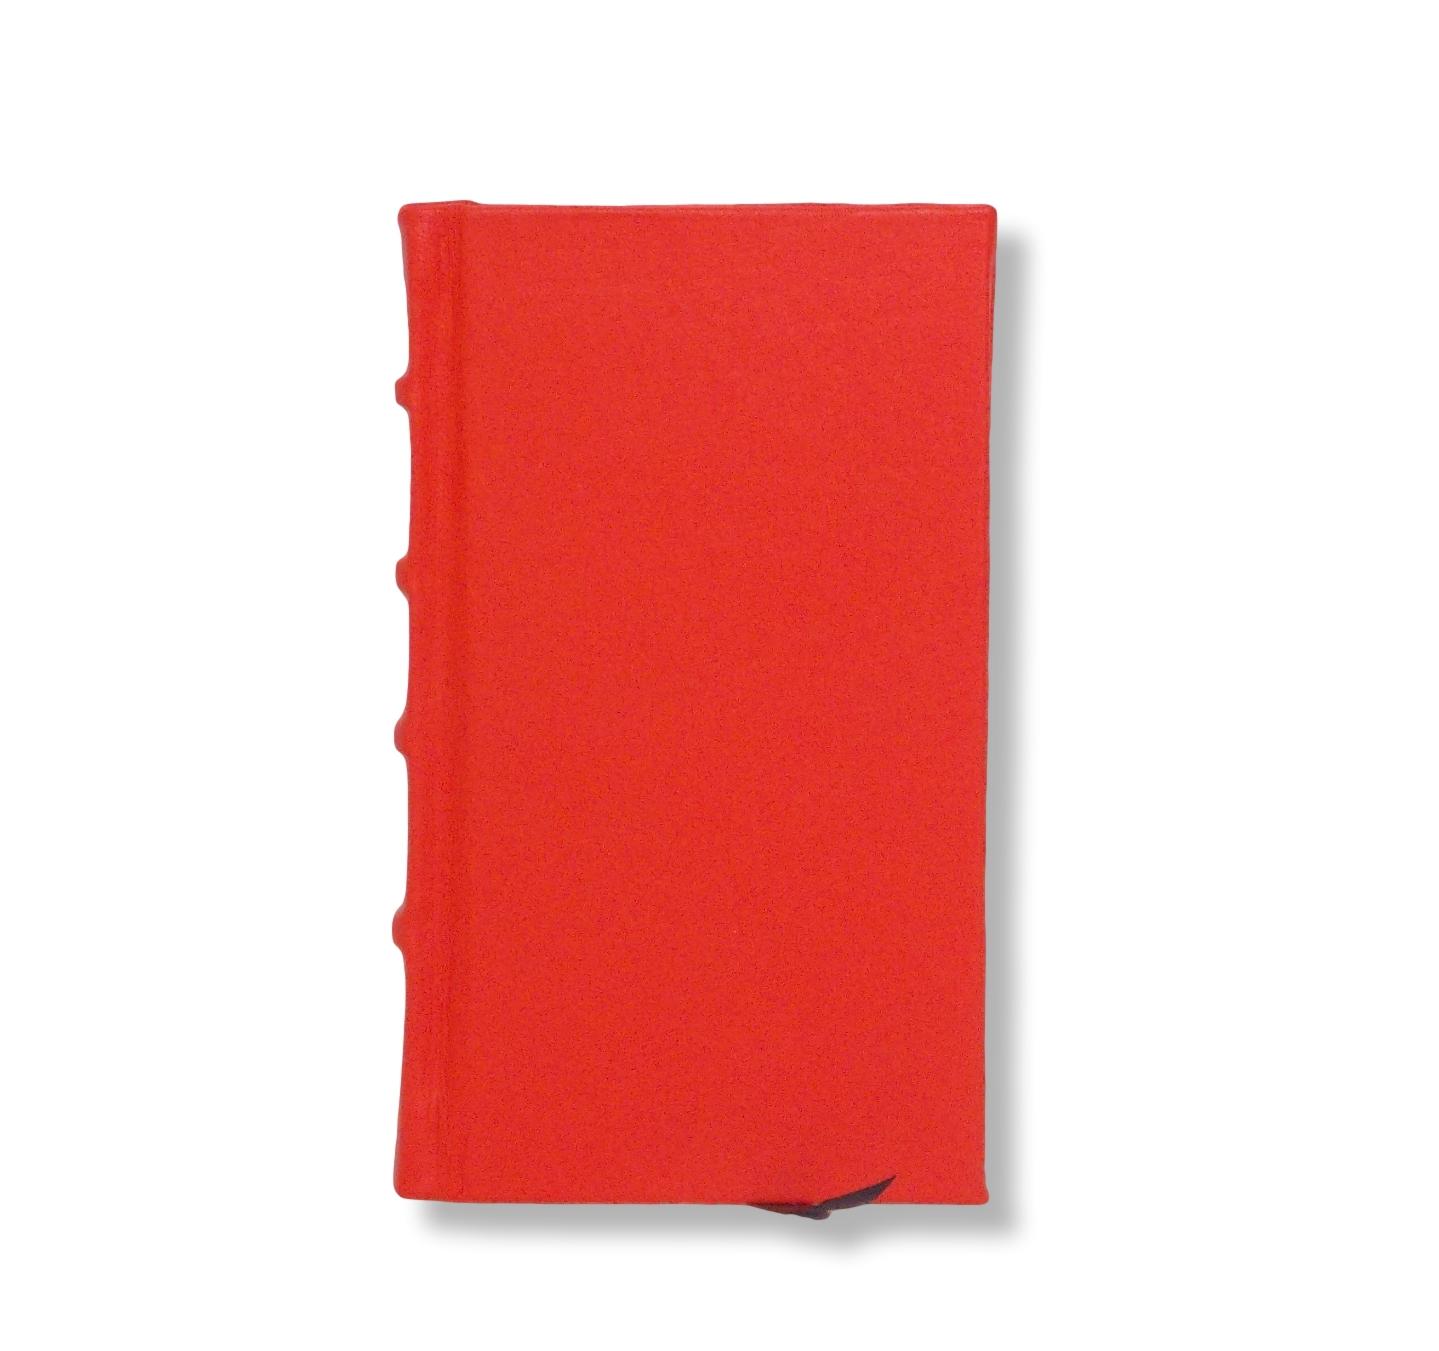 Slimline leather journal in orange